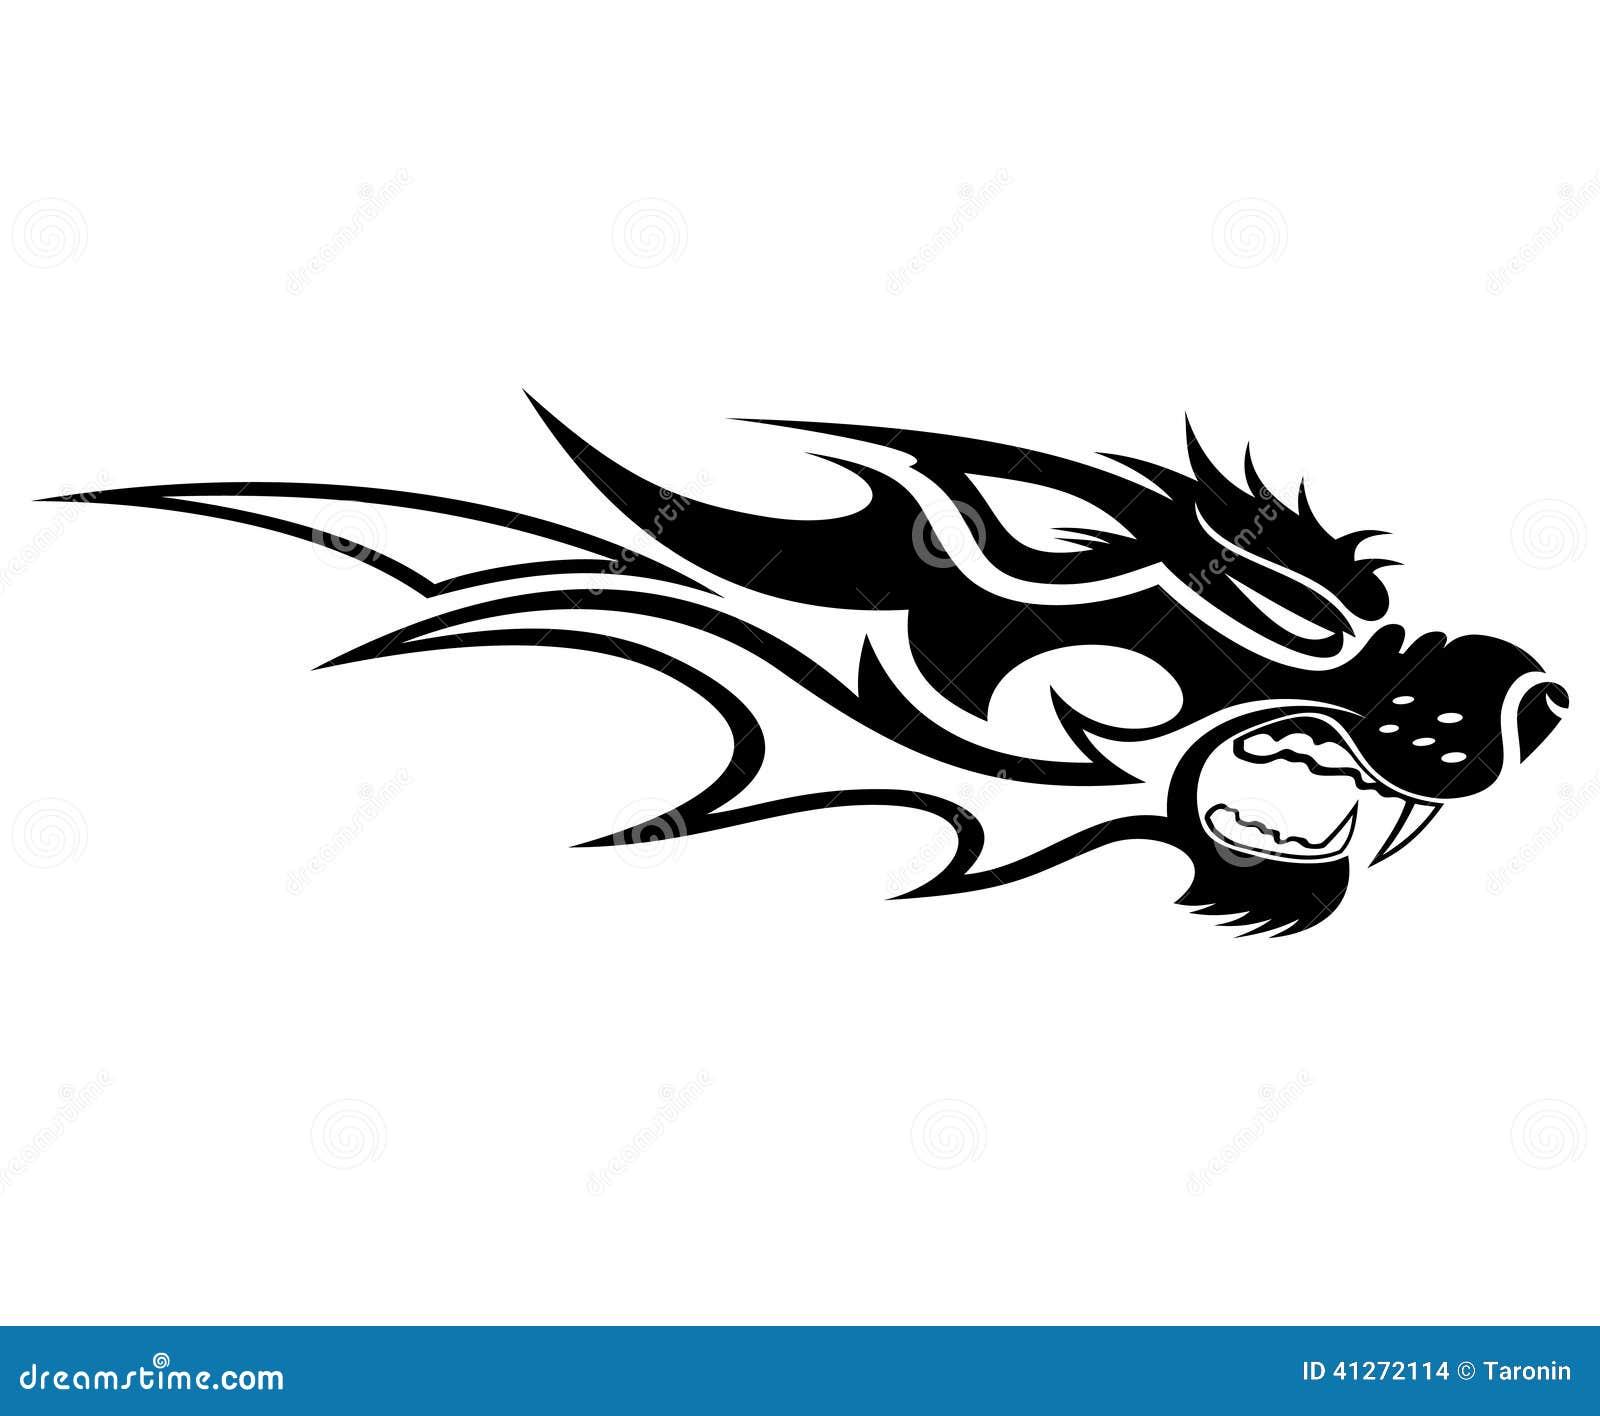 Animal Tattoo Stock Vector Illustration Of Black Pattern 41272114